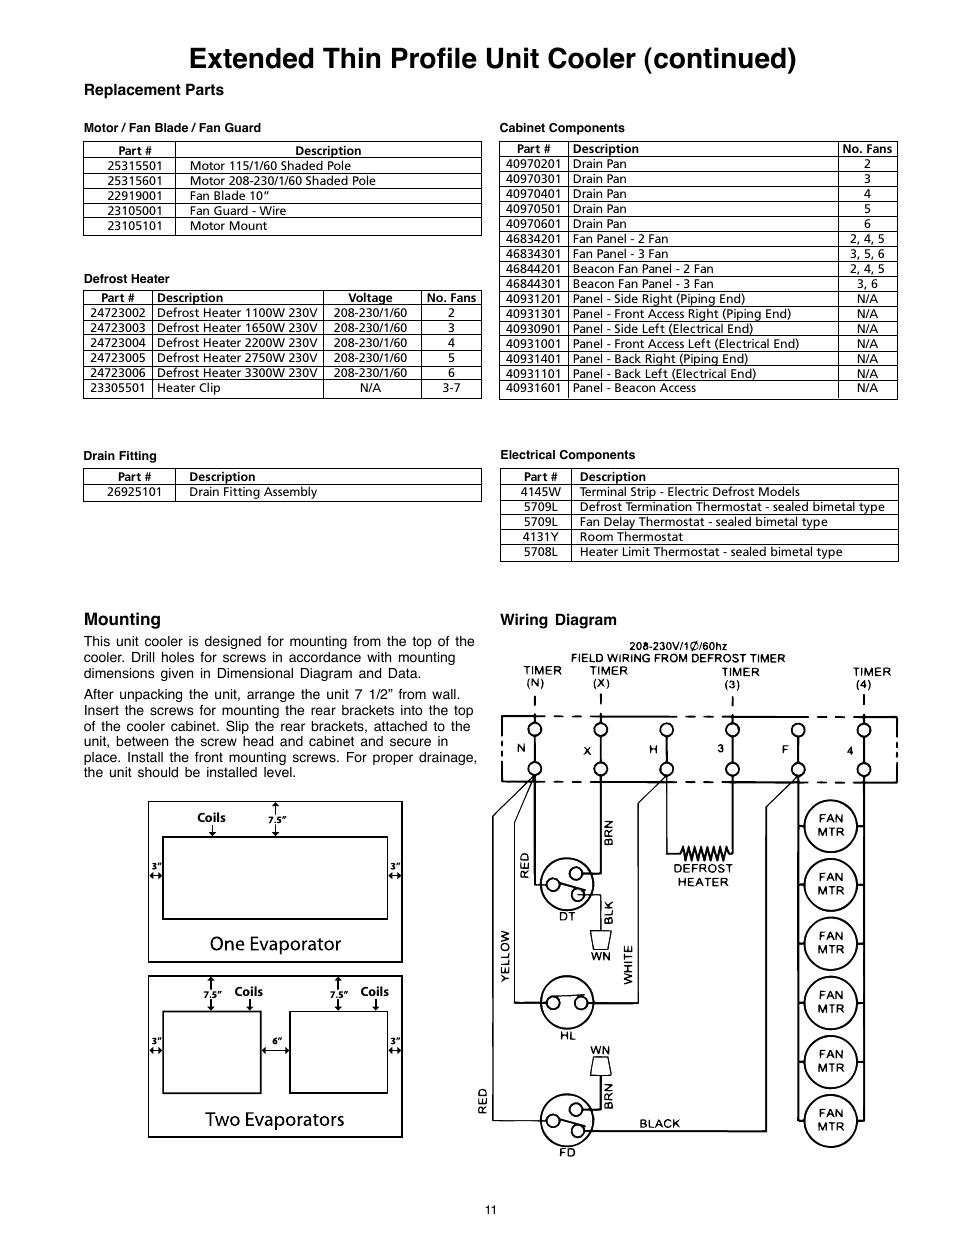 Larkin Evaporator Wiring Diagram 32 Images Brushless Esc Circuit Bohn Commercial Freezer Electrical Heatcraft Refrigeration Products 25005601 Page11resize